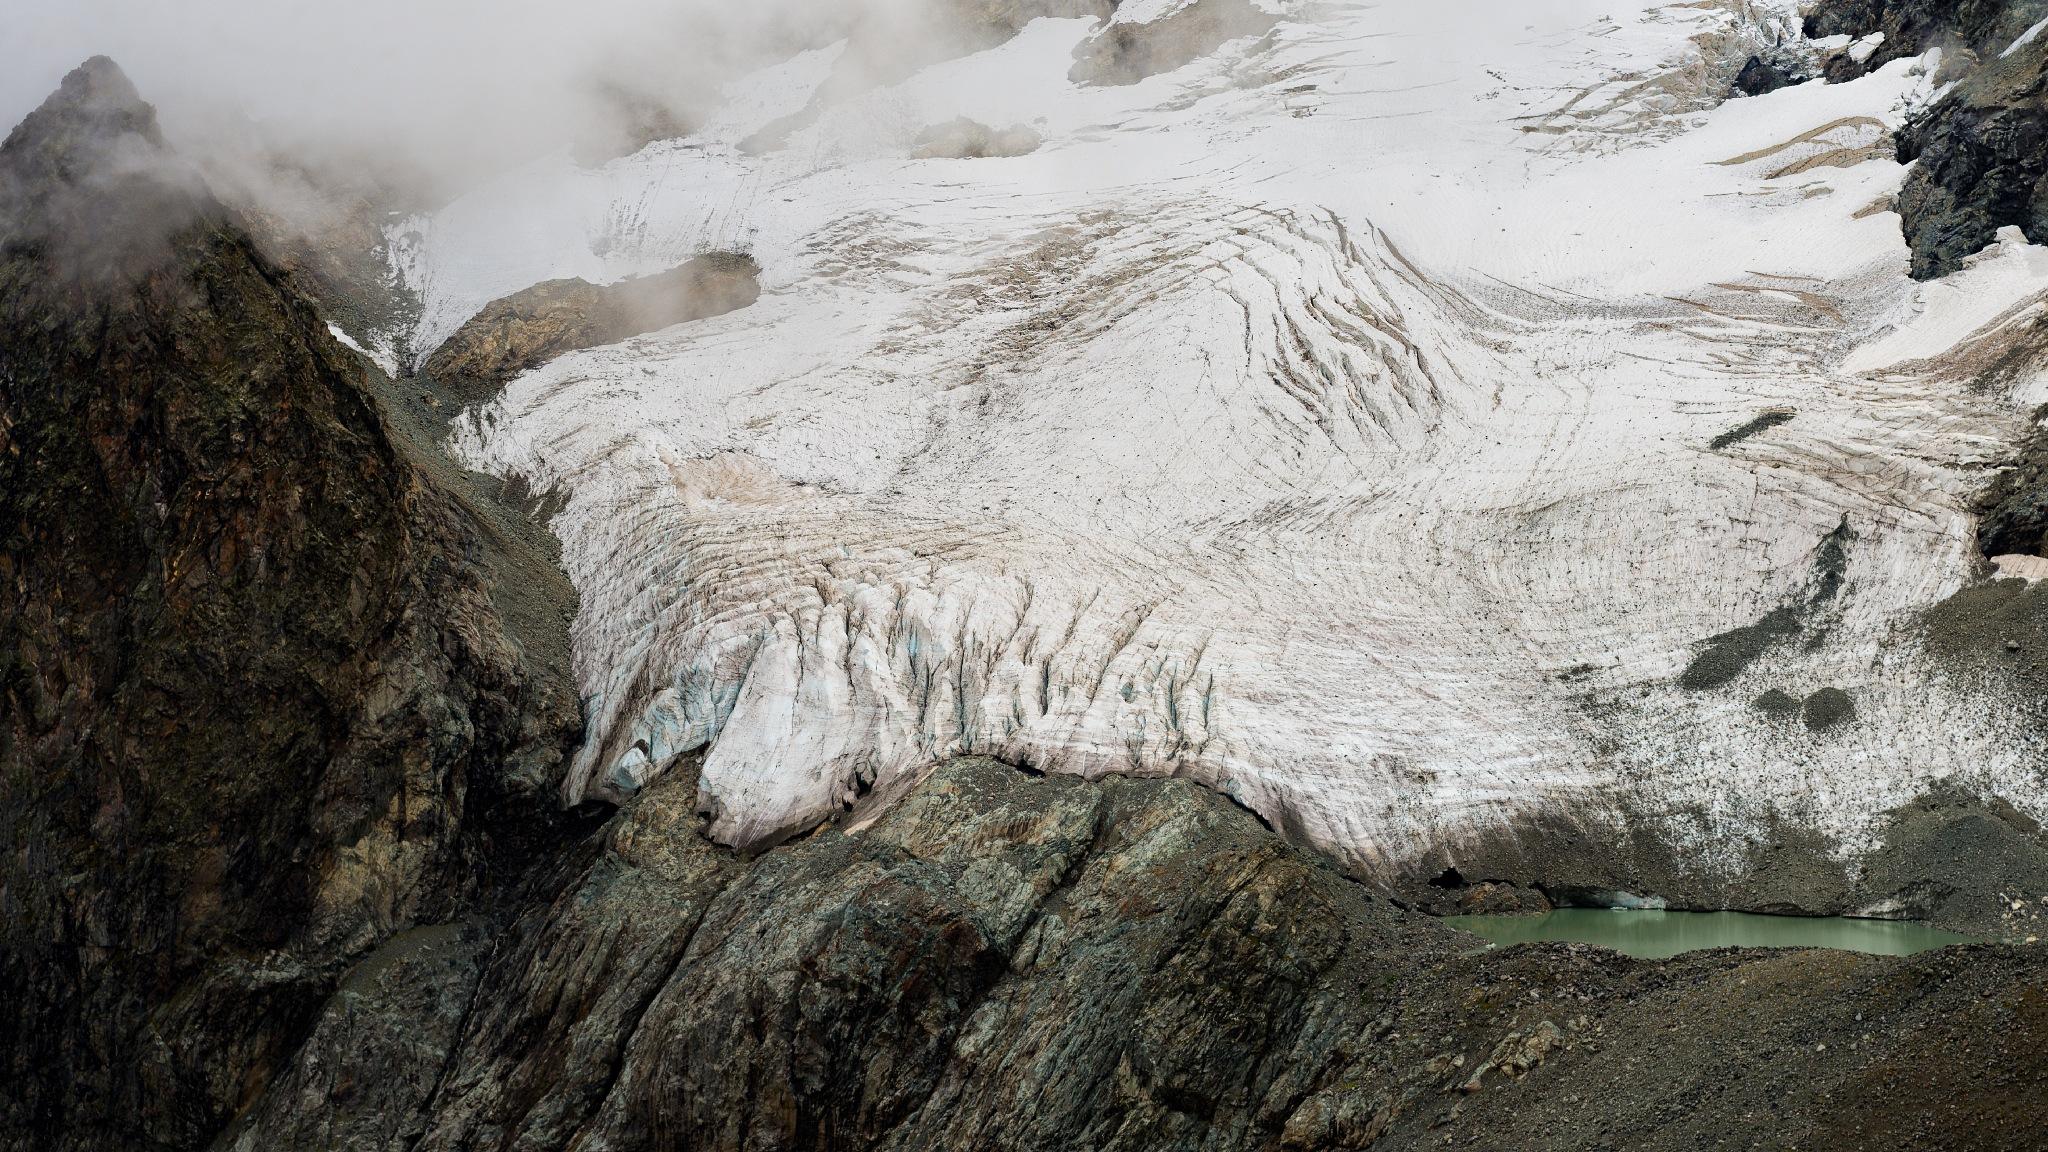 Ice and stone by Alexander Plekhanov